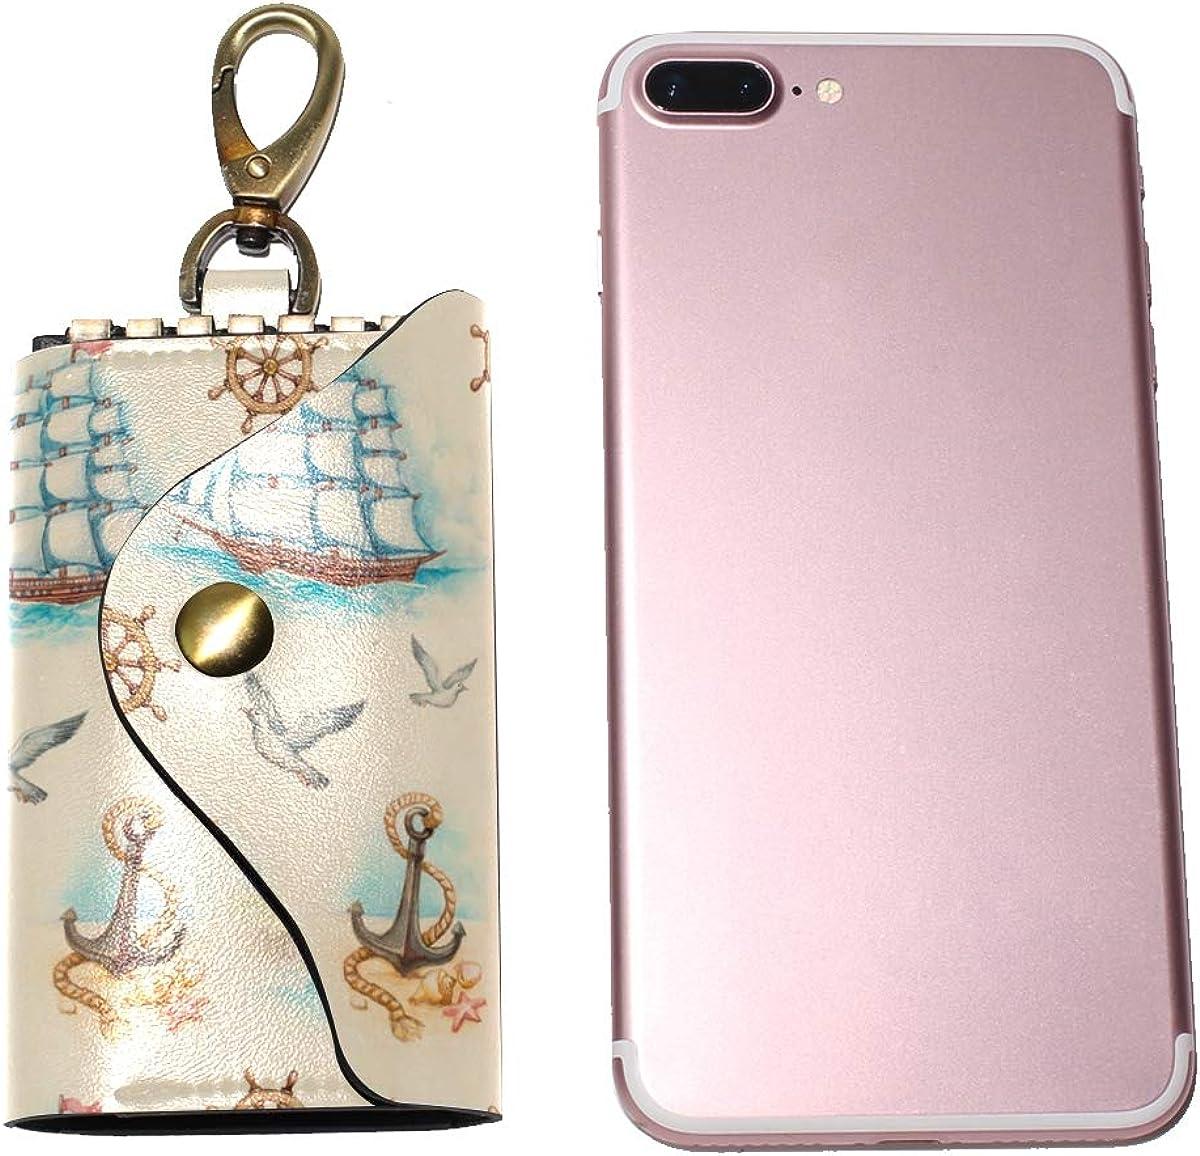 KEAKIA Nautical Pattern Leather Key Case Wallets Tri-fold Key Holder Keychains with 6 Hooks 2 Slot Snap Closure for Men Women